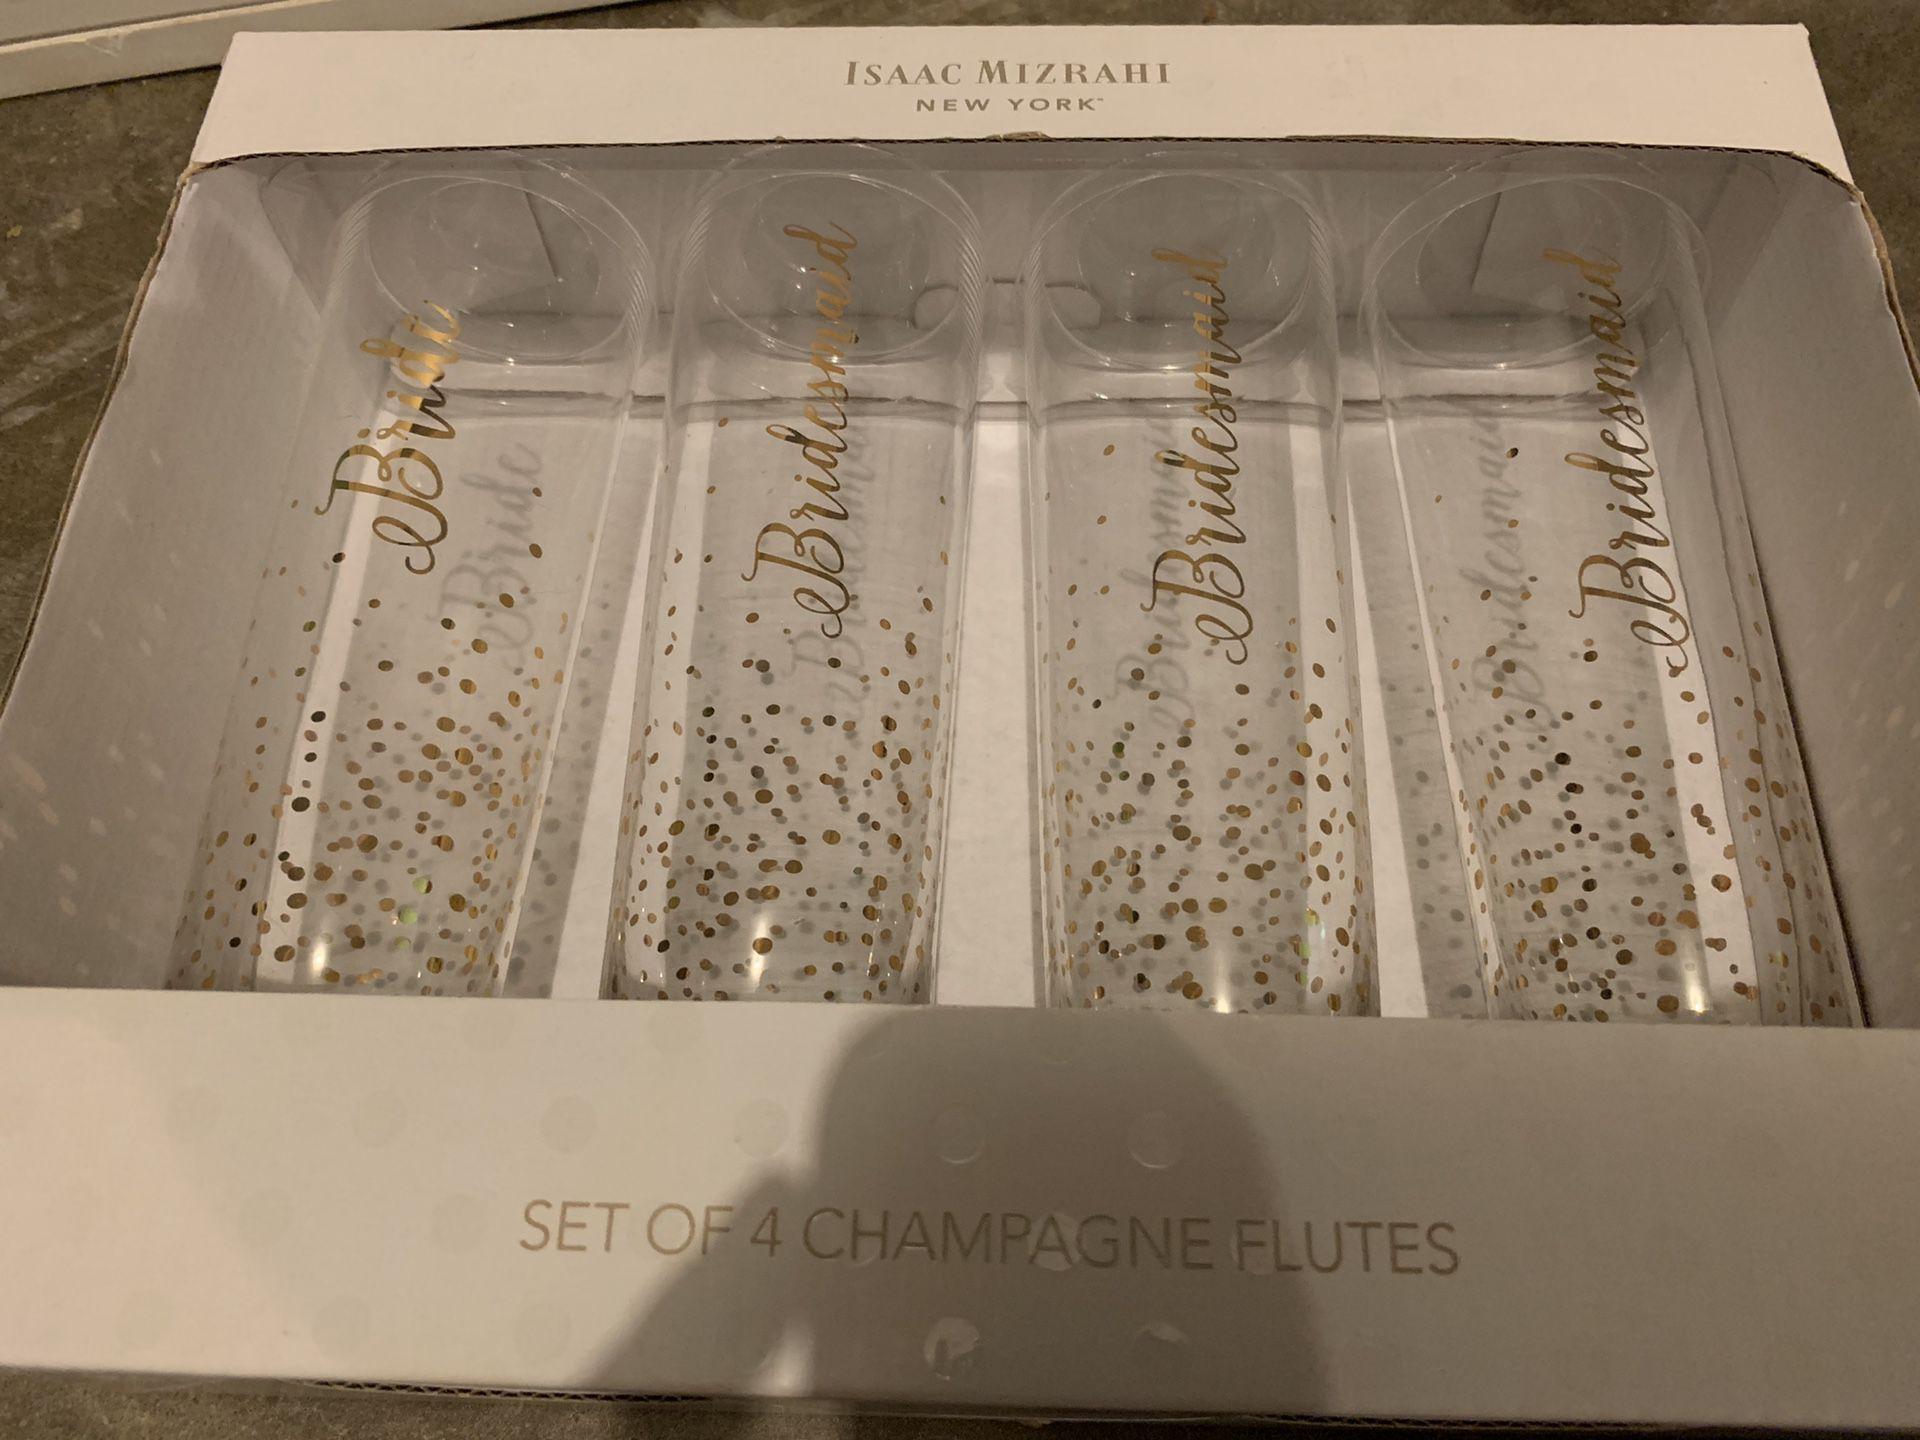 Isaac Mizrahi Champagne Flutes